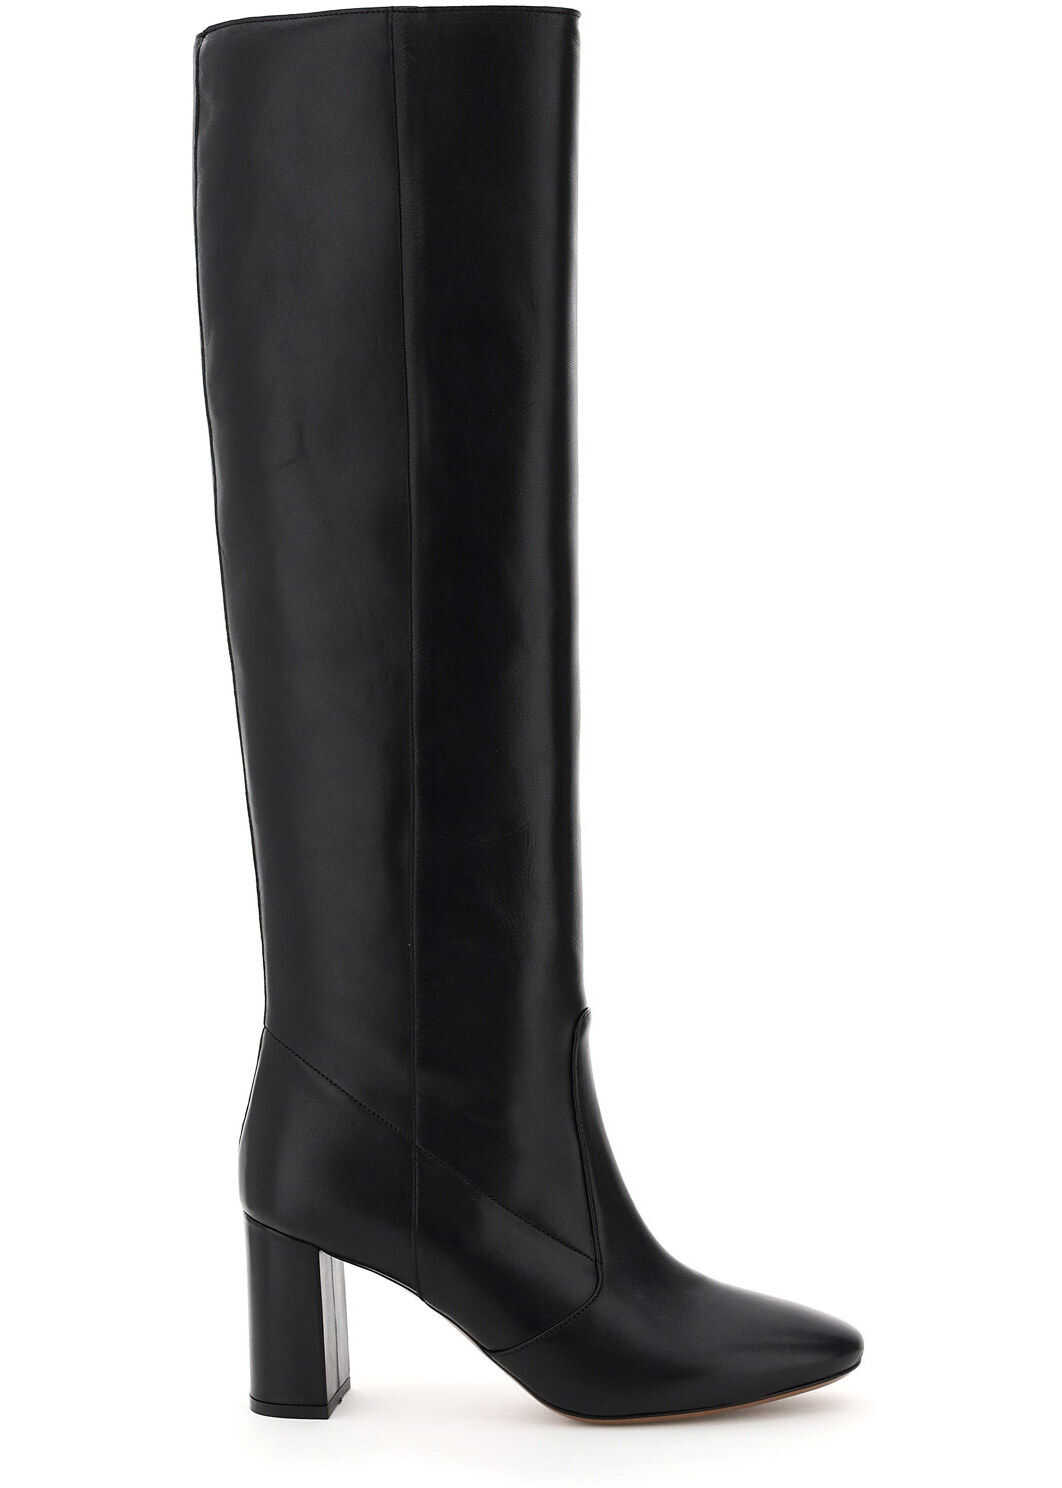 L'Autre Chose Nappa High Boots LDL078 75WP26115 BLACK imagine b-mall.ro